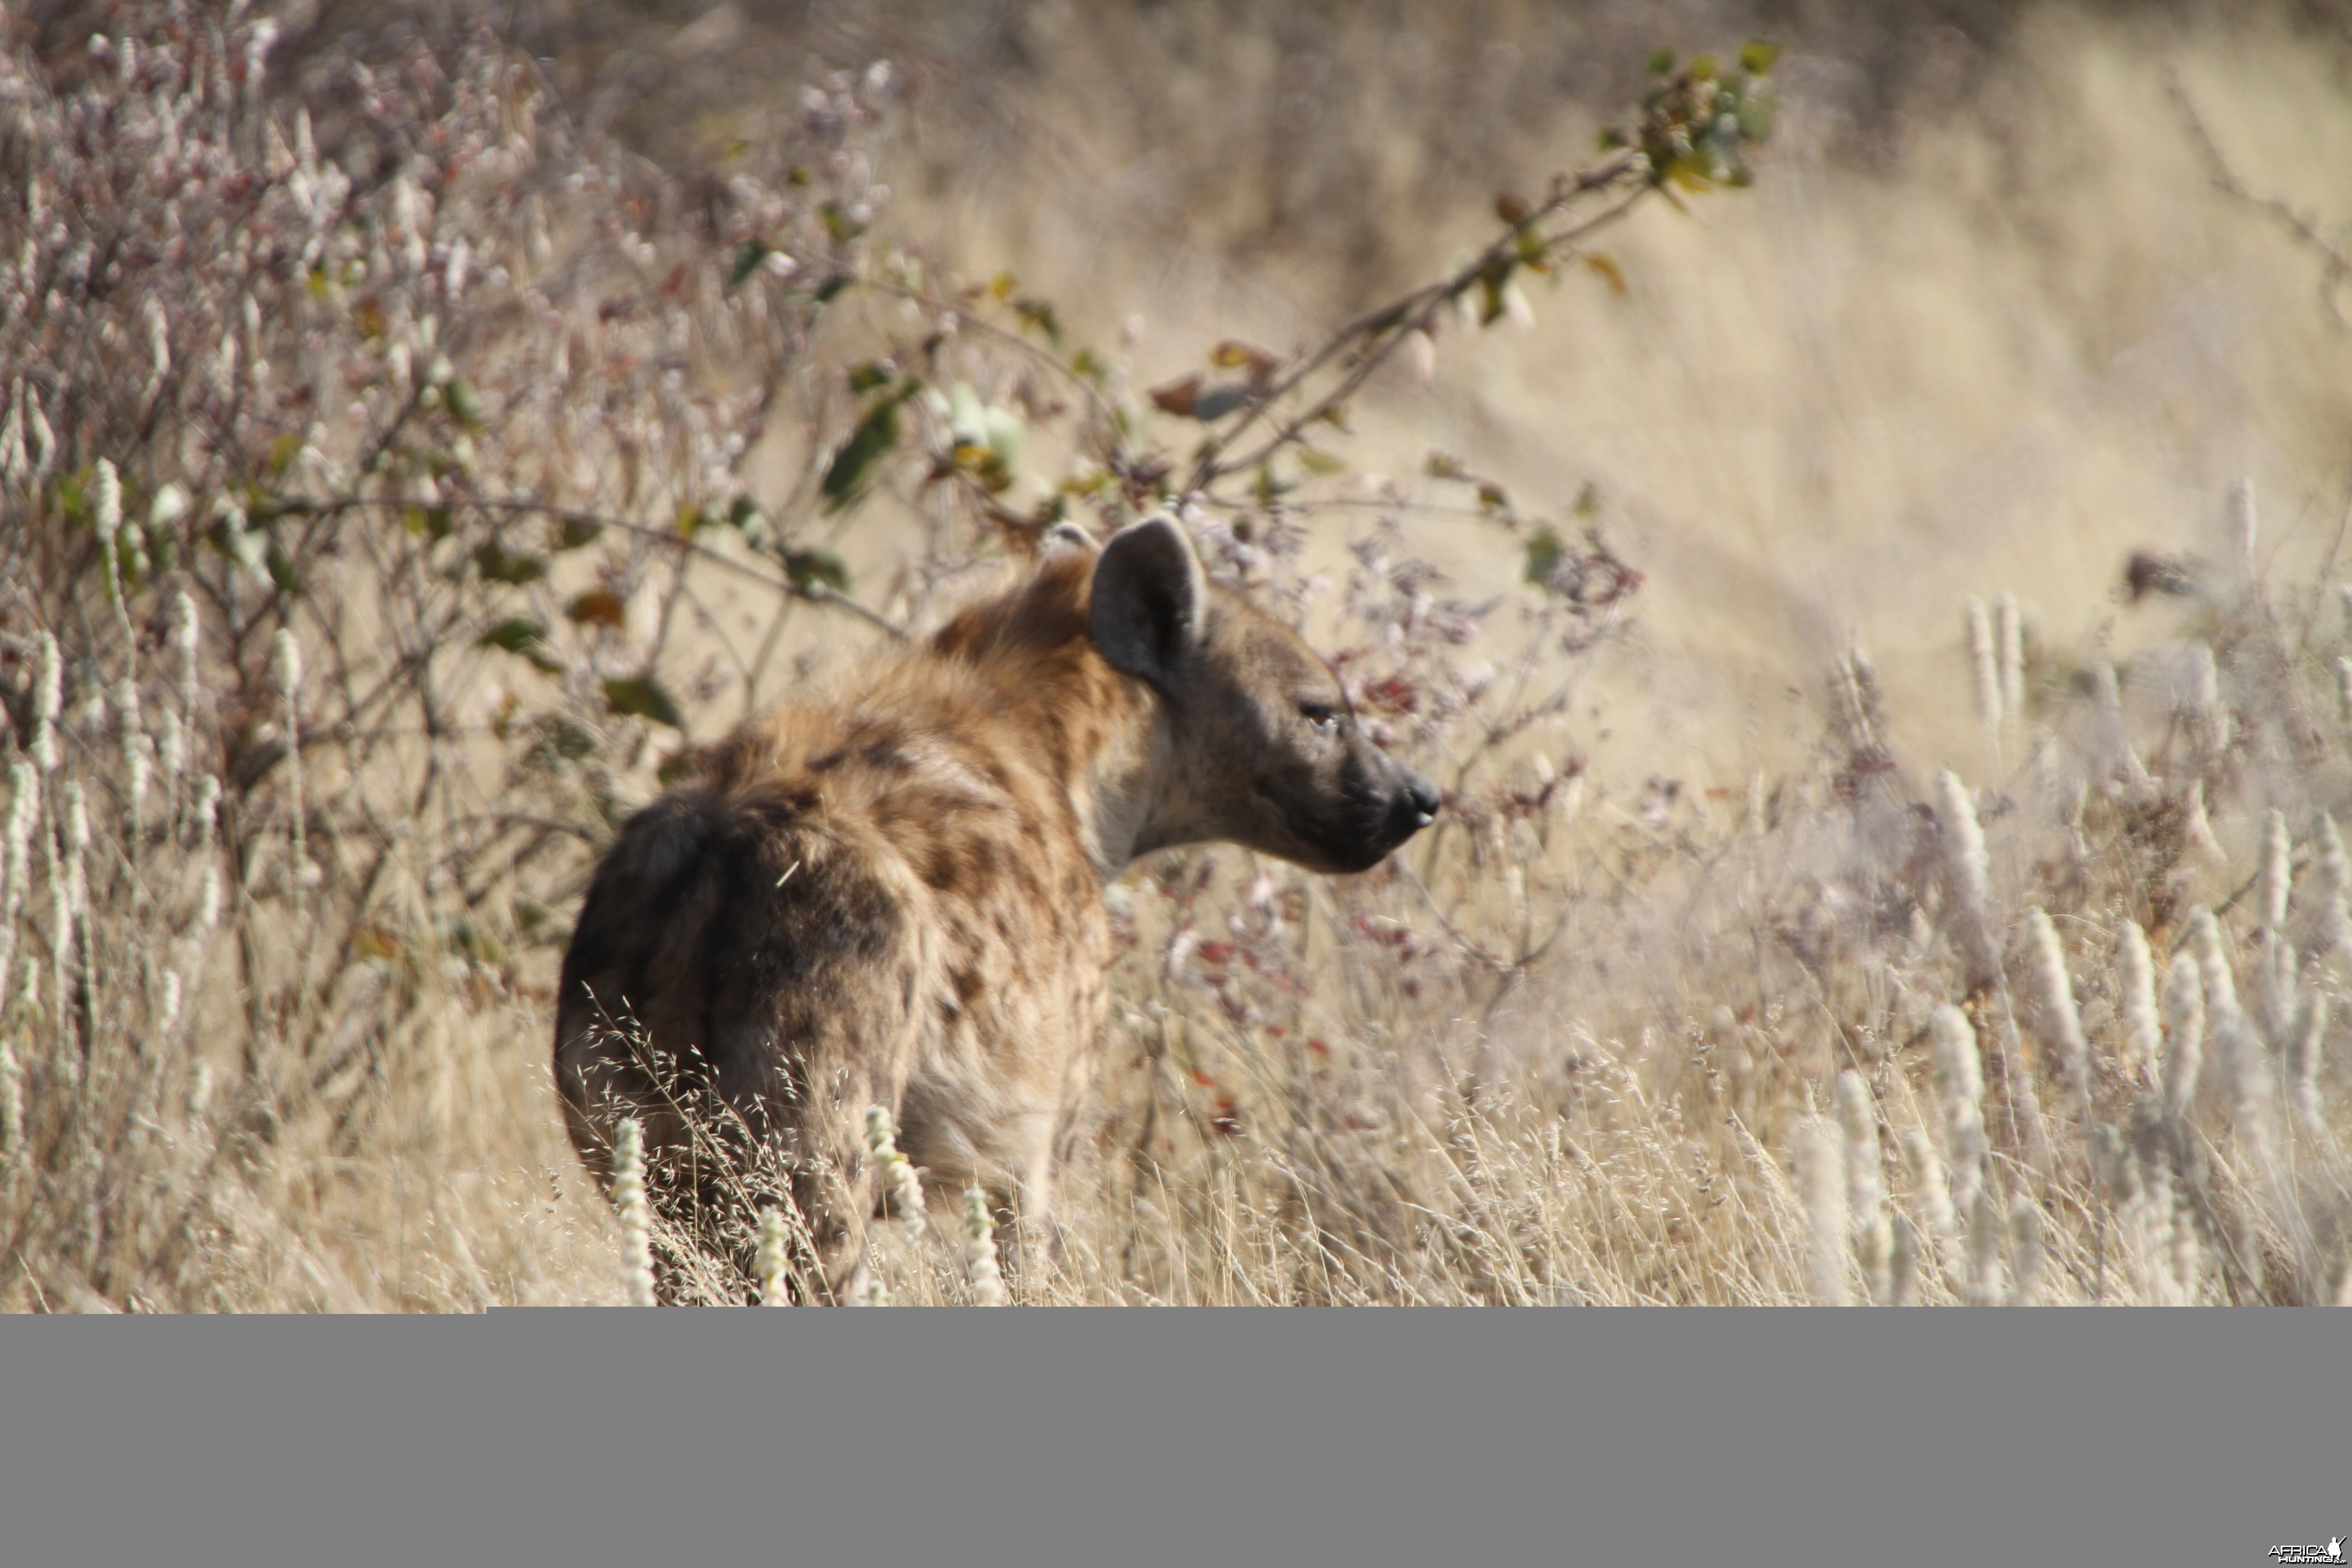 Spotted Hyena at Etosha National Park